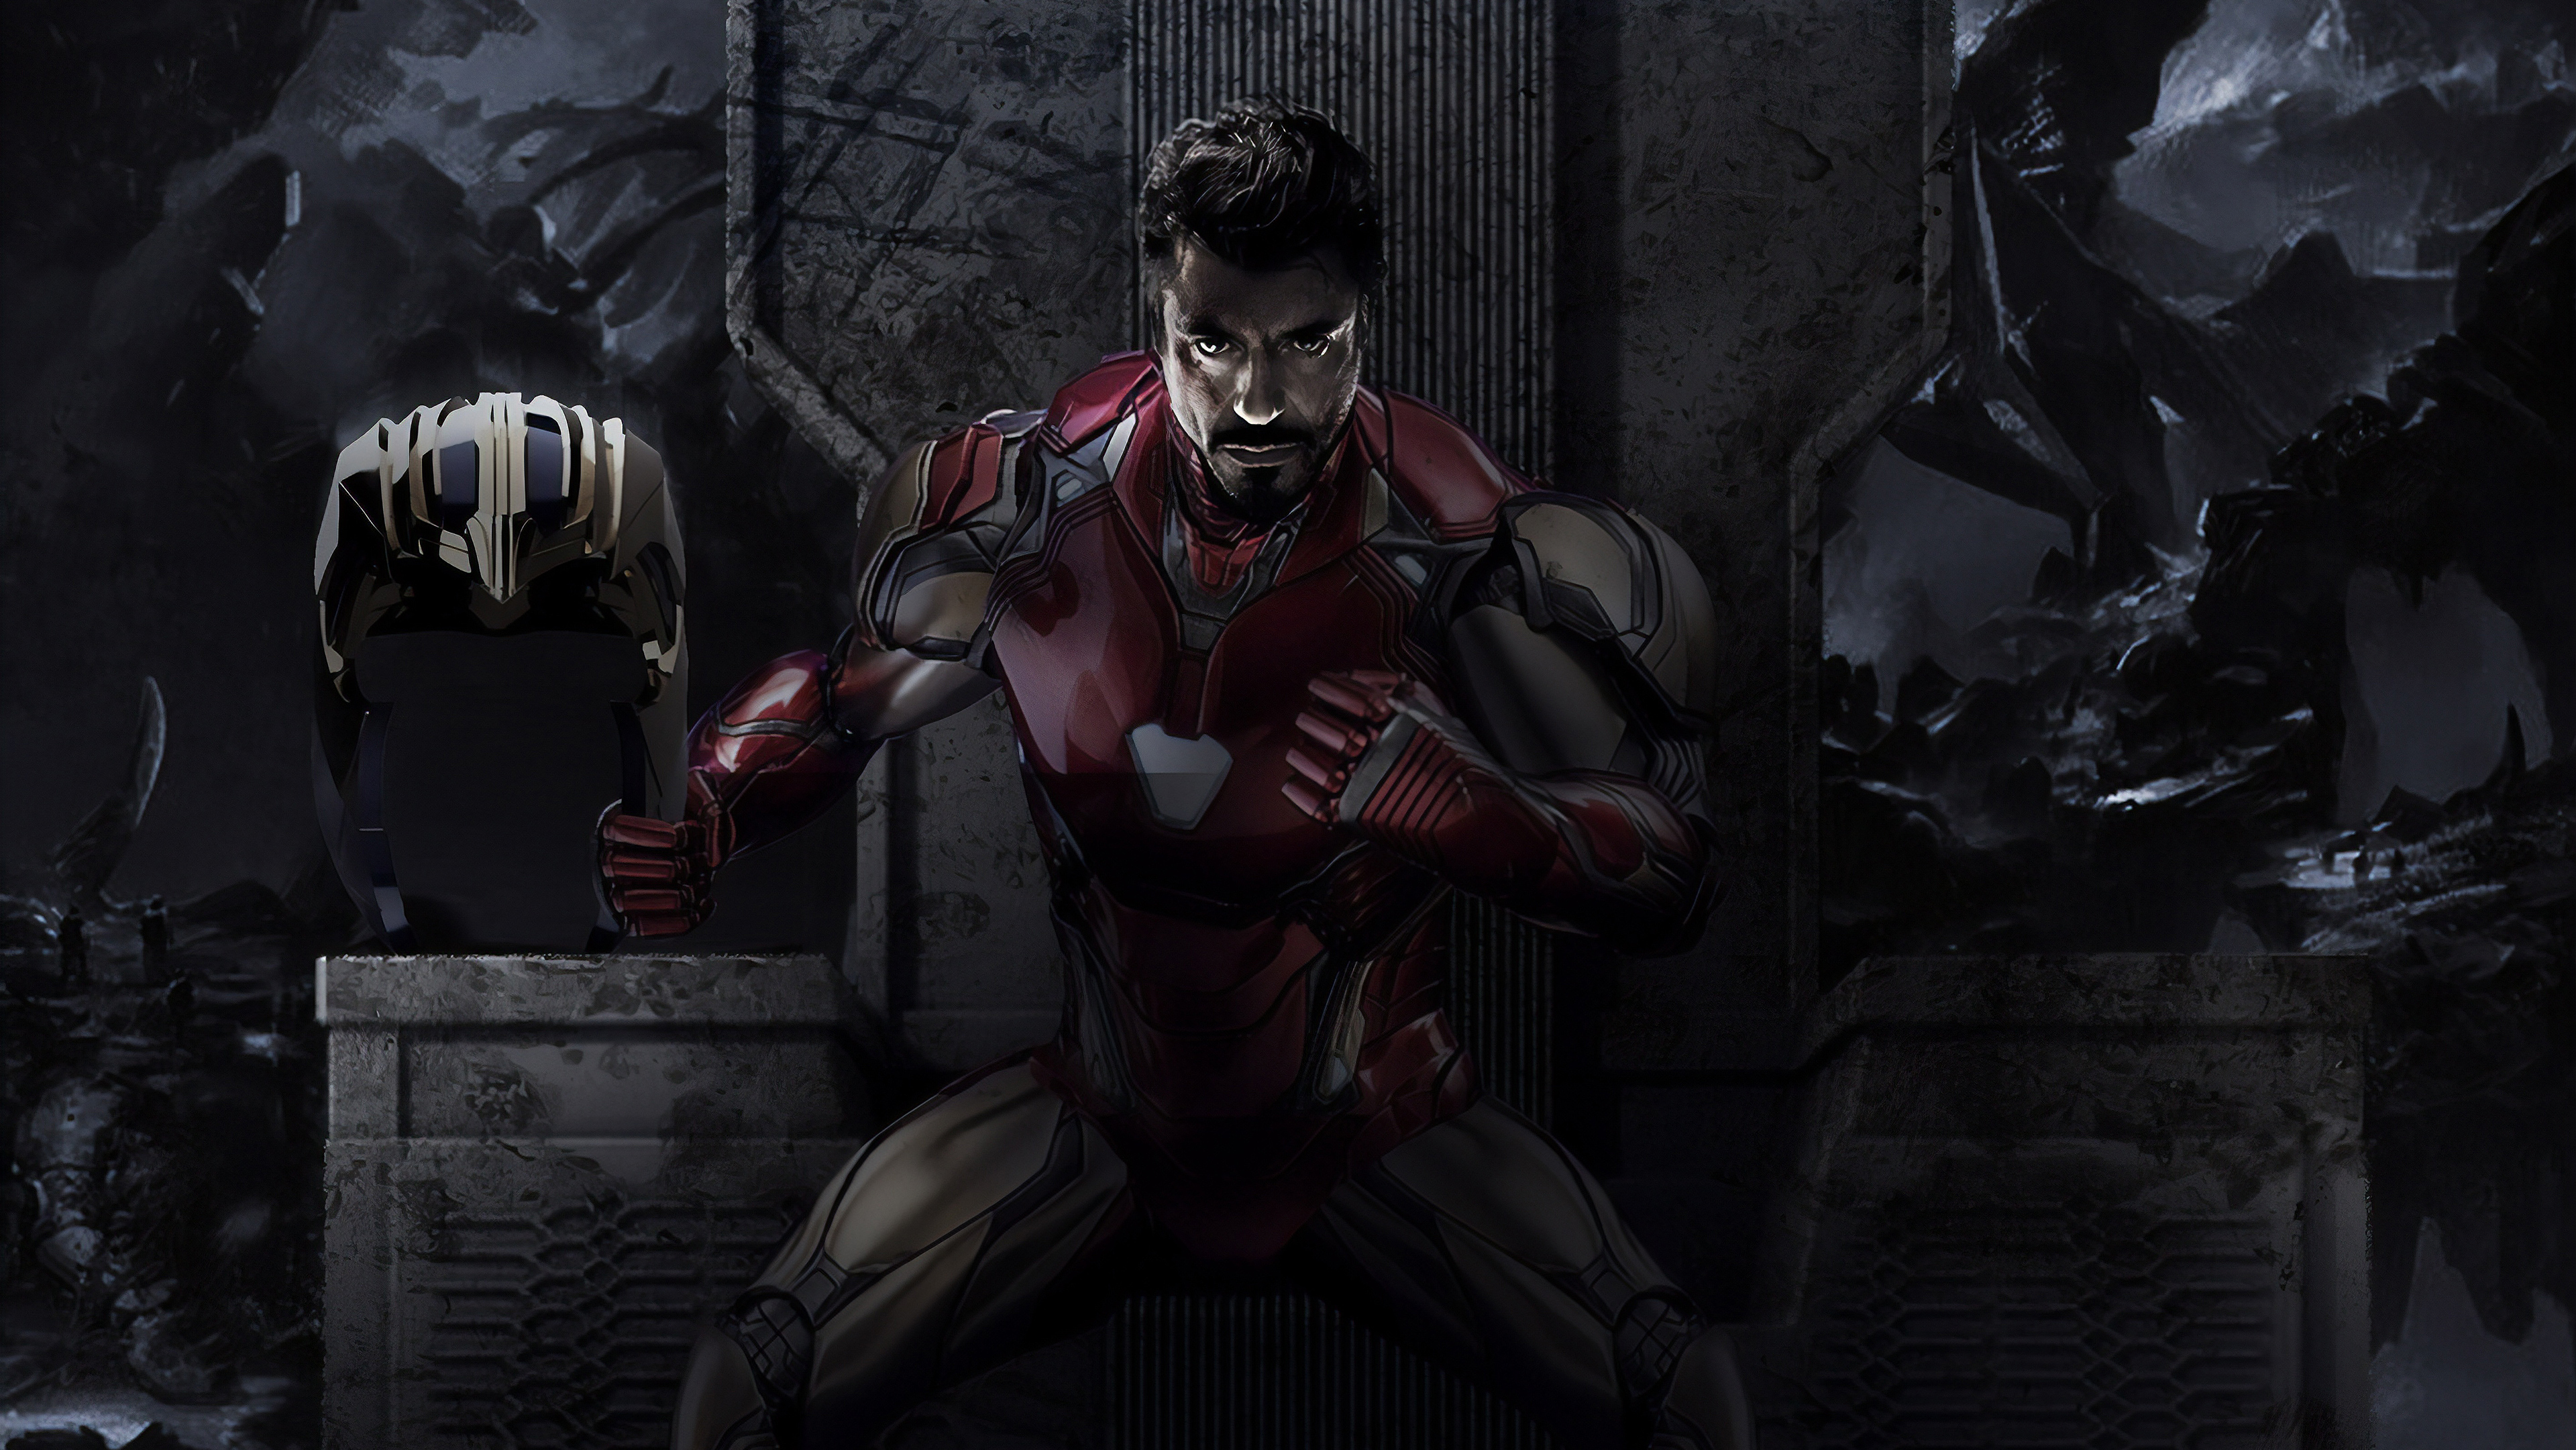 Iron Man Endgame 4k Hd Superheroes 4k Wallpapers Images